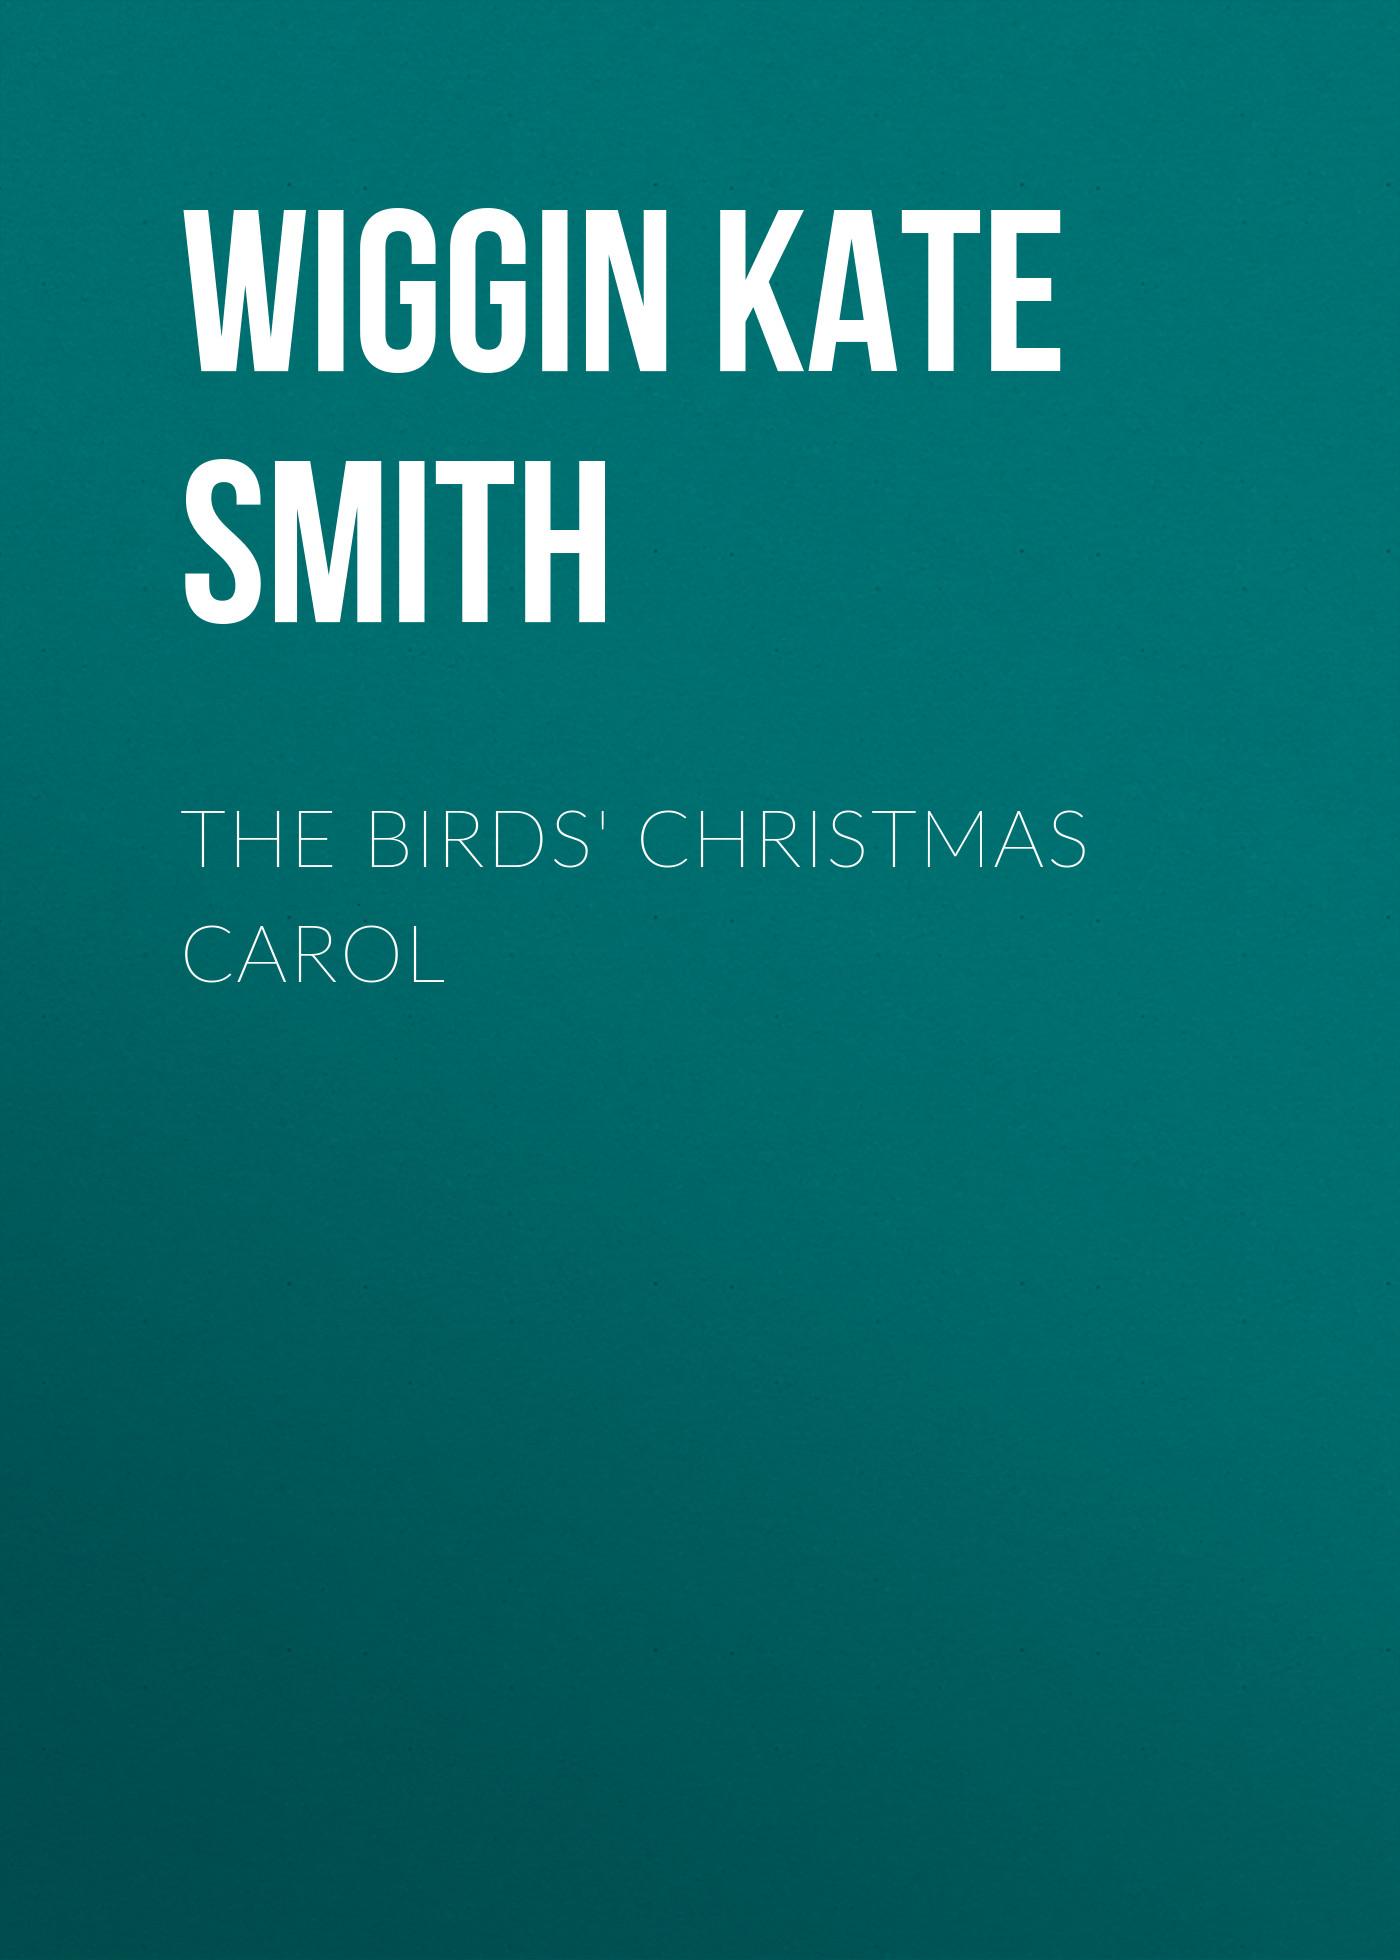 Wiggin Kate Douglas Smith The Birds' Christmas Carol kate douglas wiggin the bird s christmas carol by kate douglas wiggin fiction historical united states people